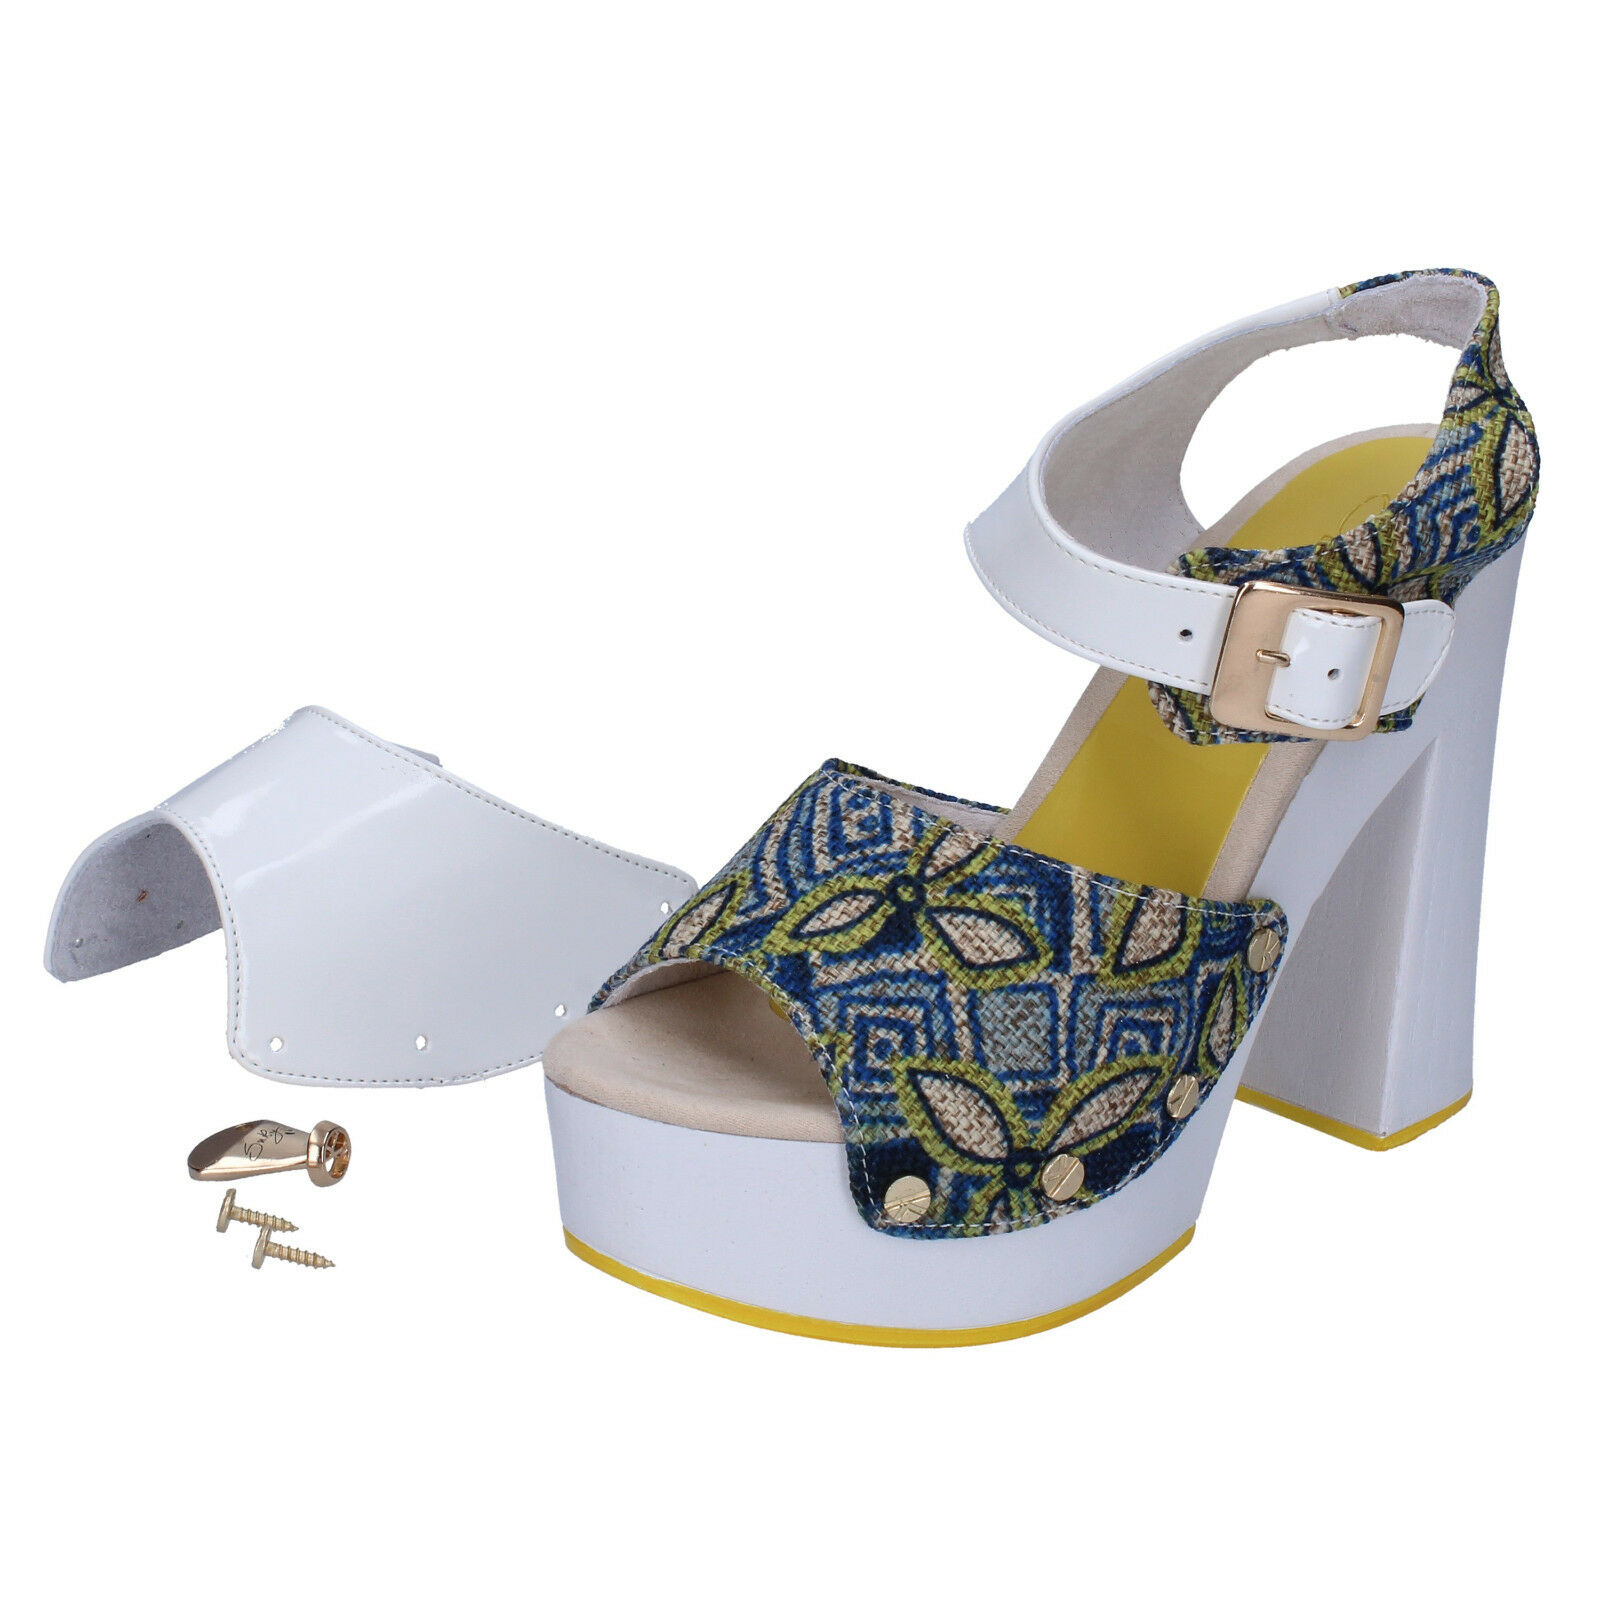 Scarpe donna SUKY BRAND 37 sandali blu ( bianco ) tessuto vernice AC487-37 | Up-to-date Stile  | Uomo/Donna Scarpa